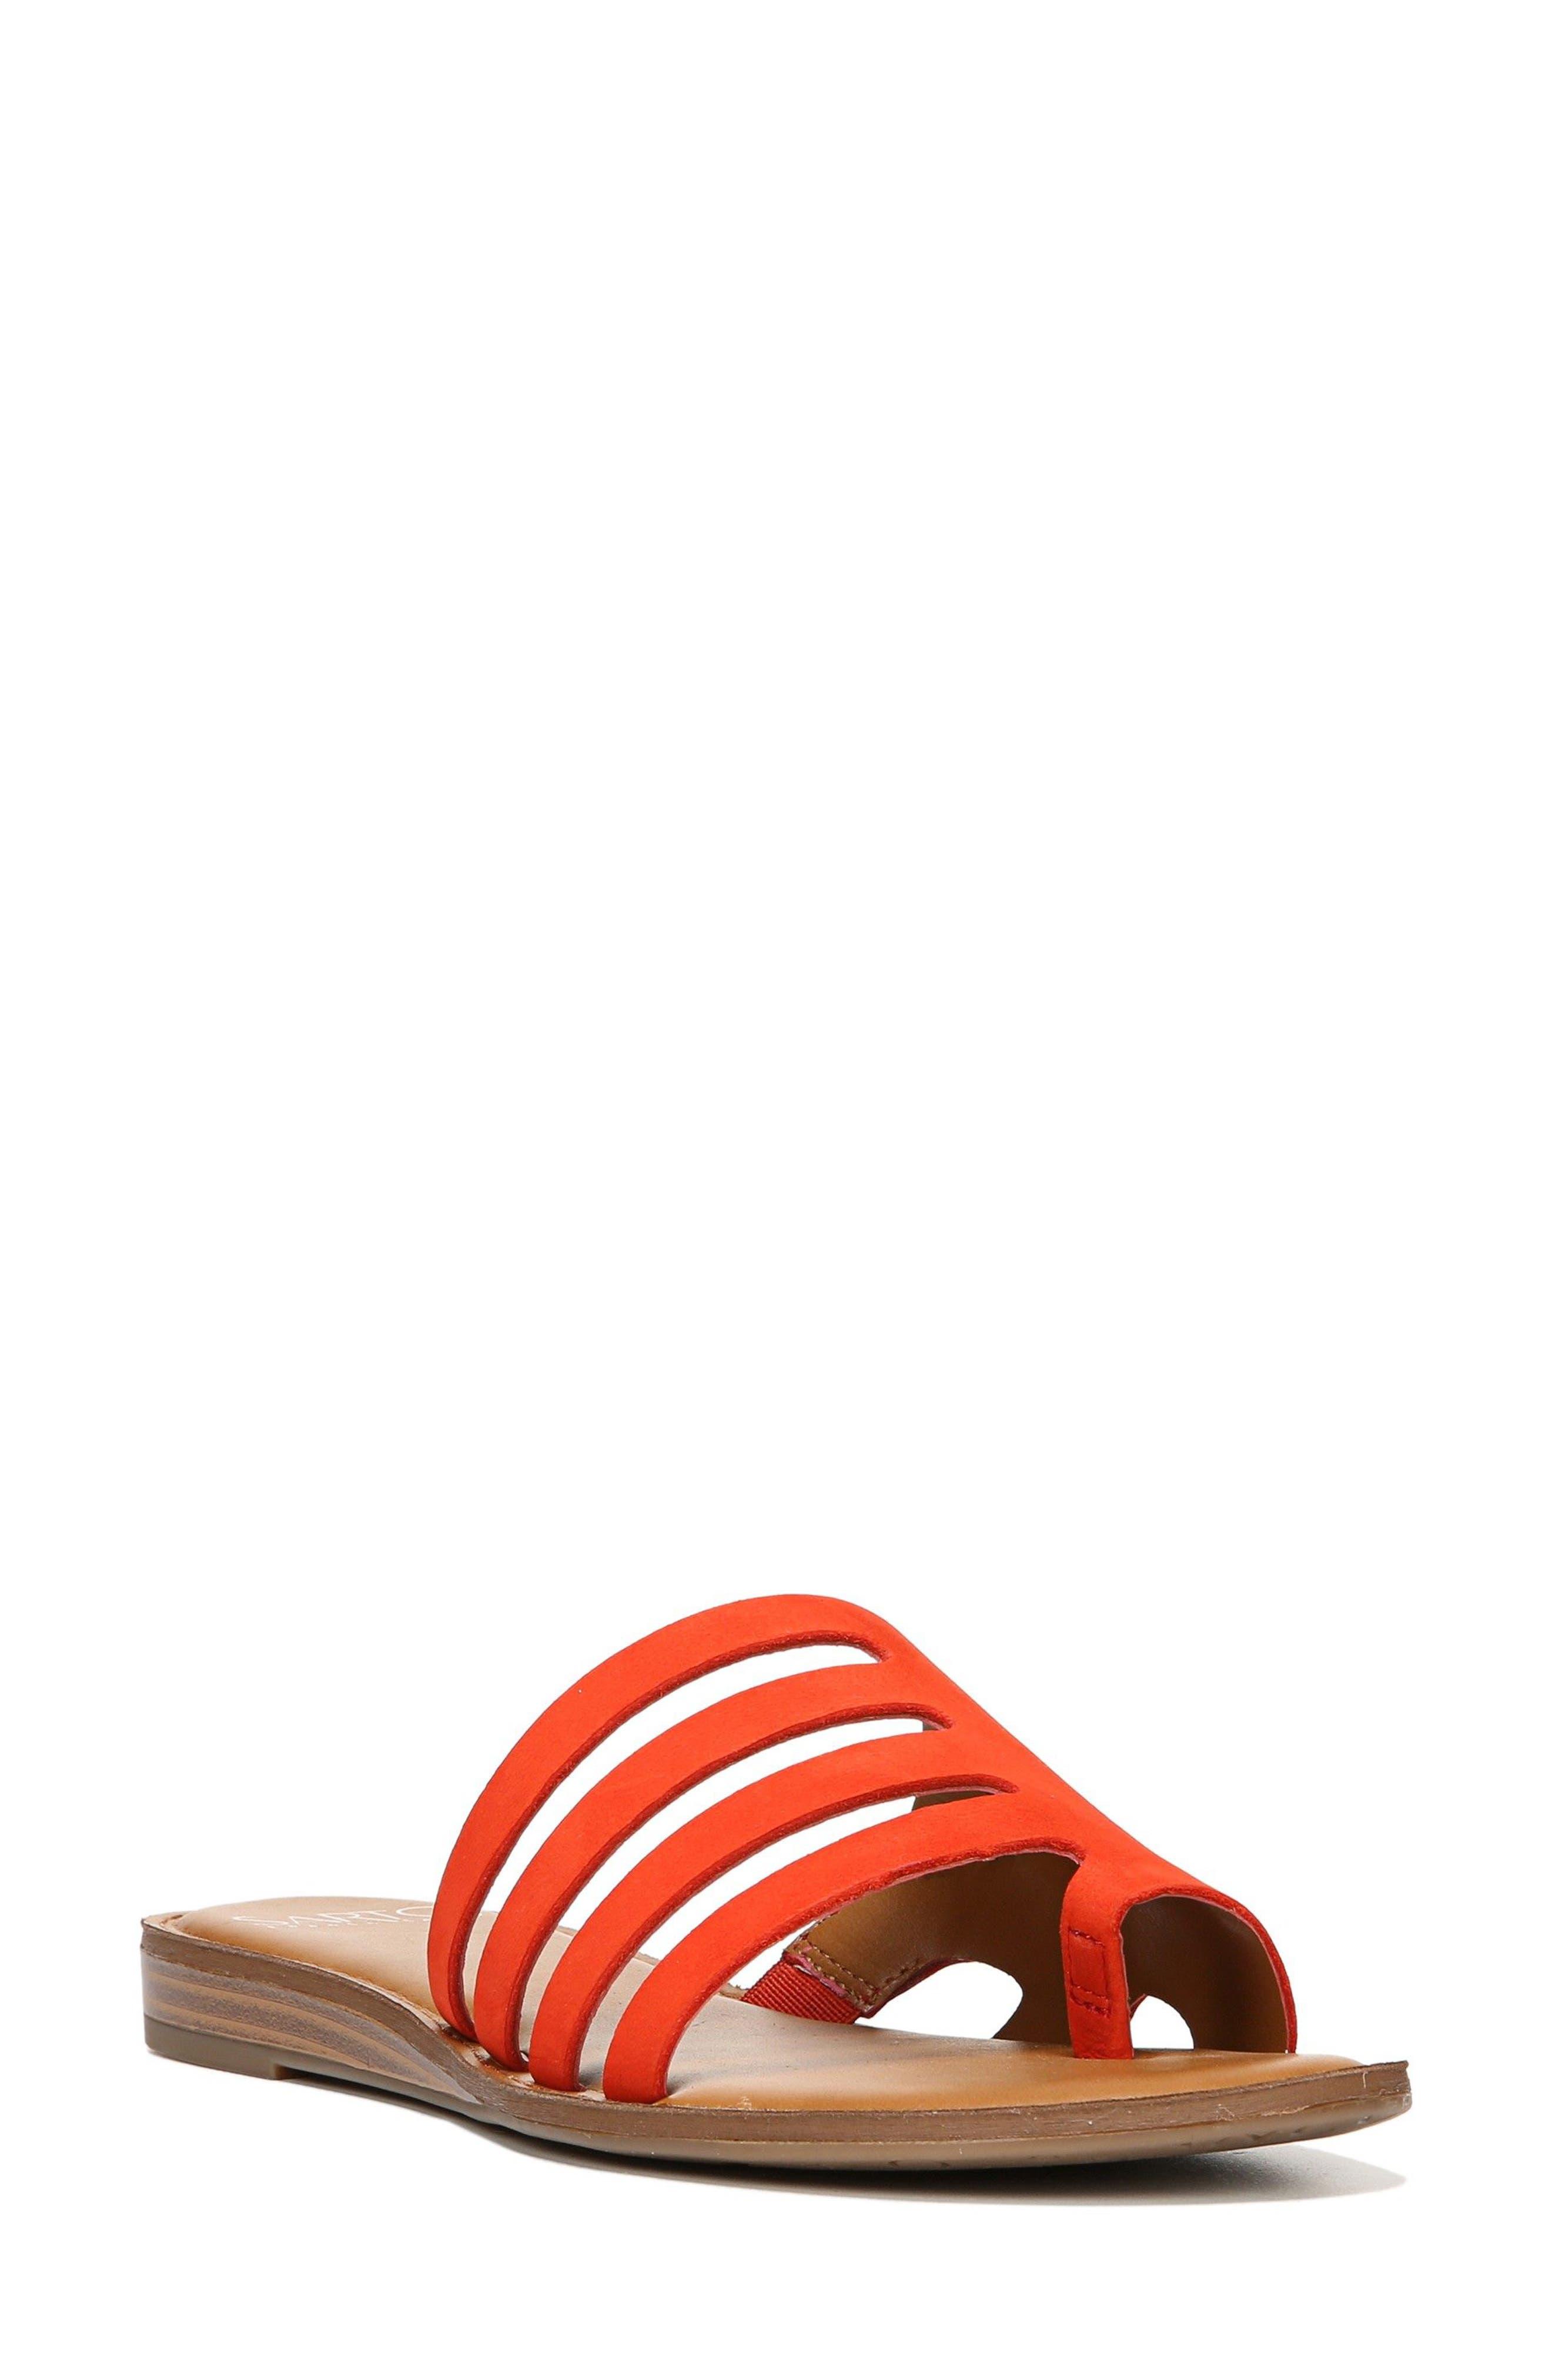 Alternate Image 1 Selected - SARTO by Franco Sarto Gala Slide Sandal (Women)